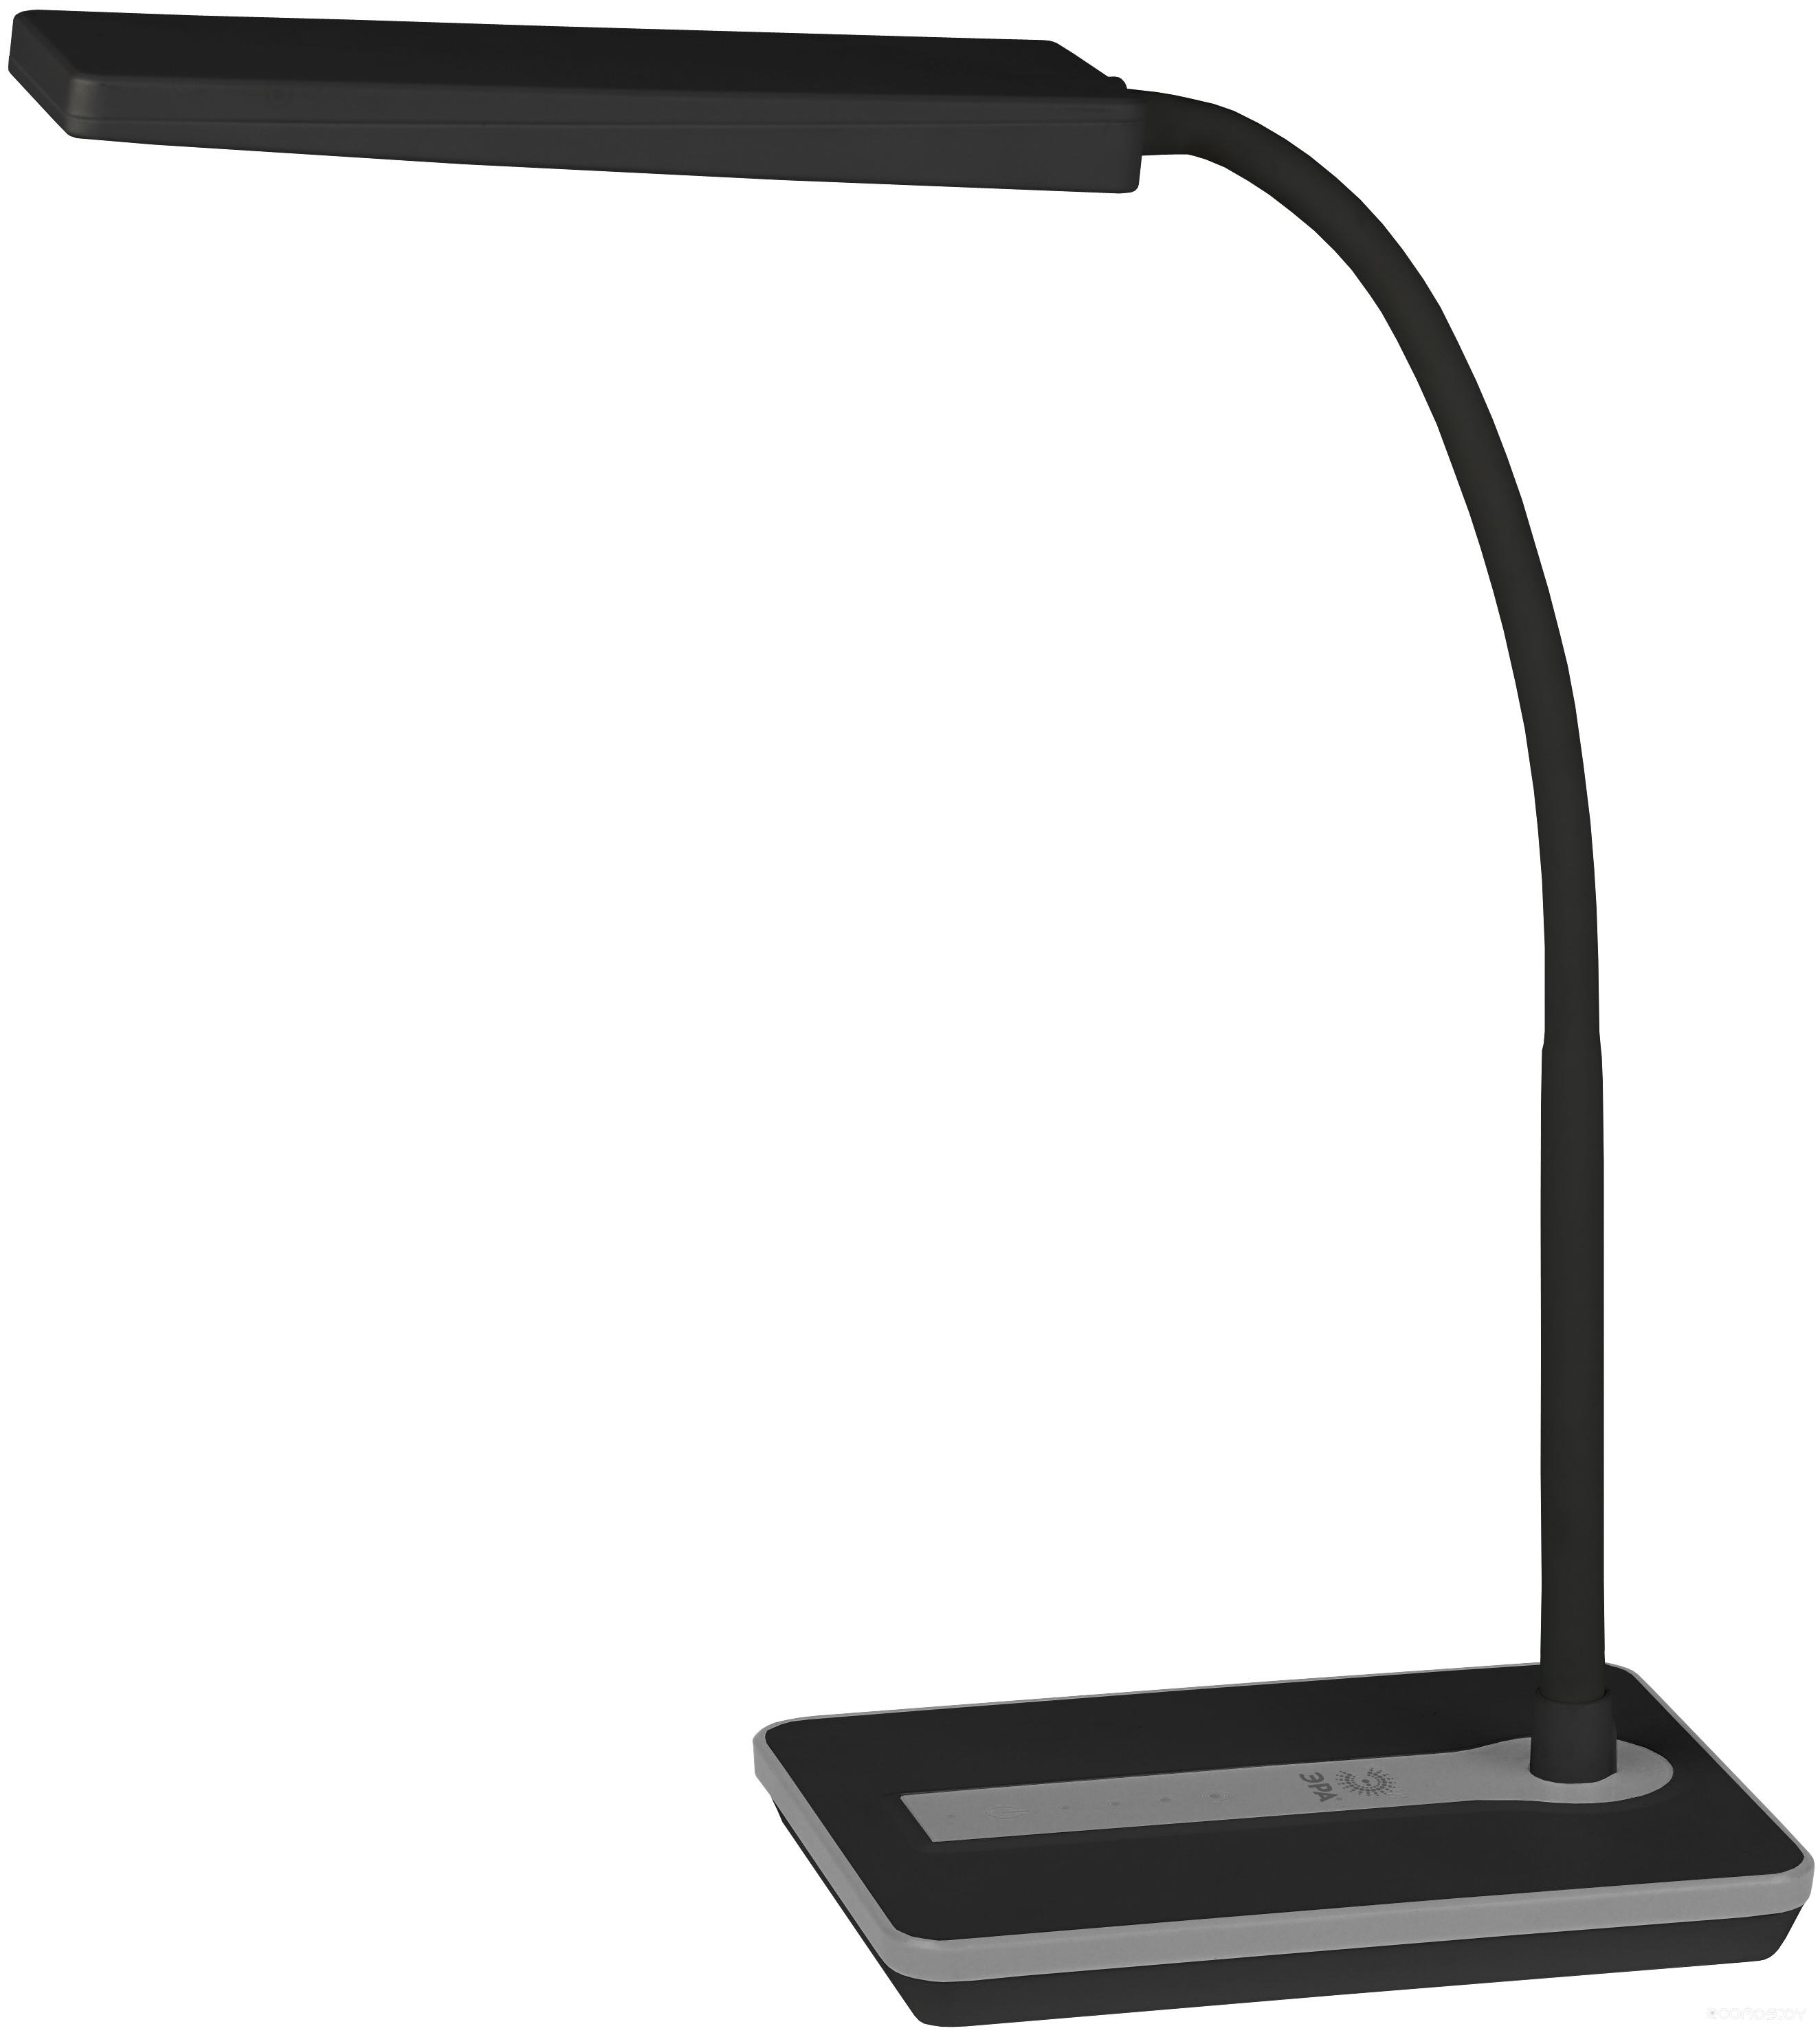 Светильник настольный Эра NLED-446-9W-BK